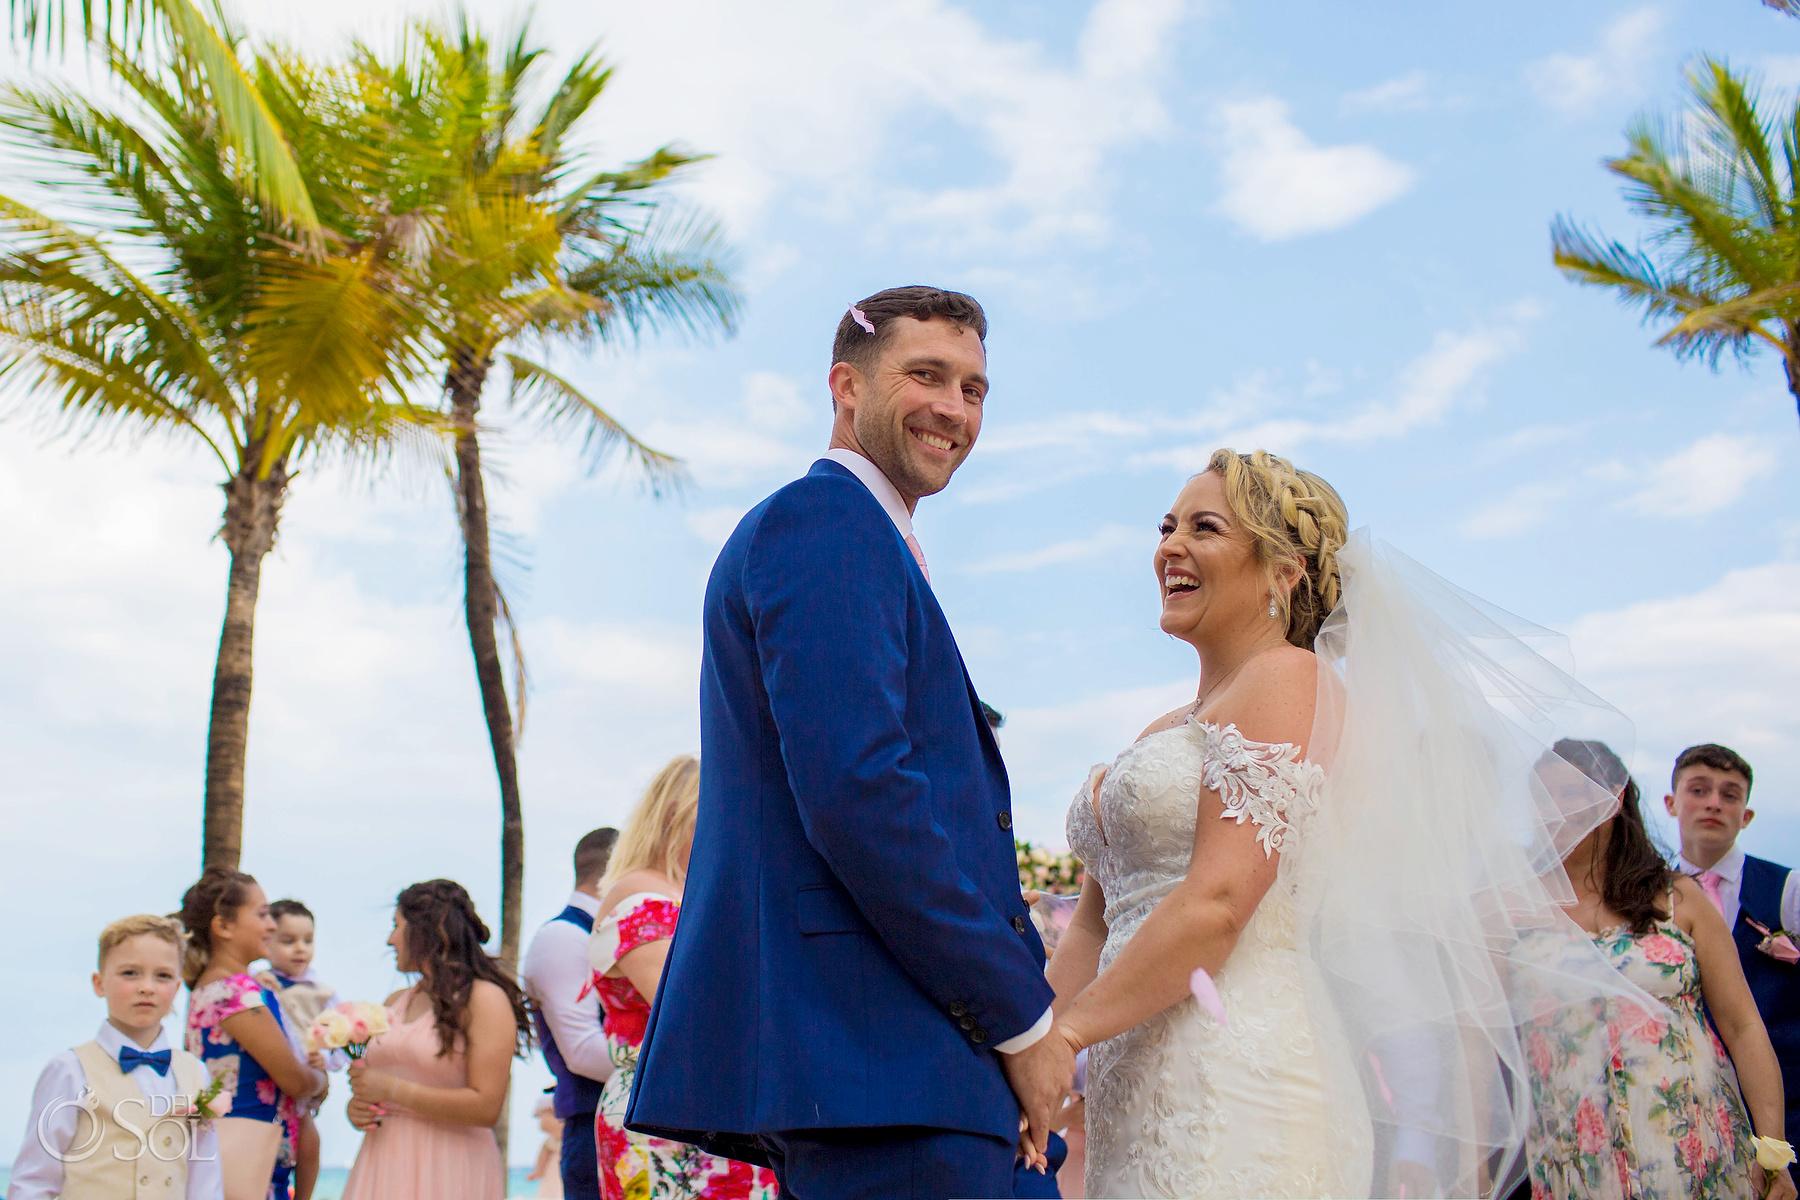 Riu Palace Wedding Photographer bride and groom